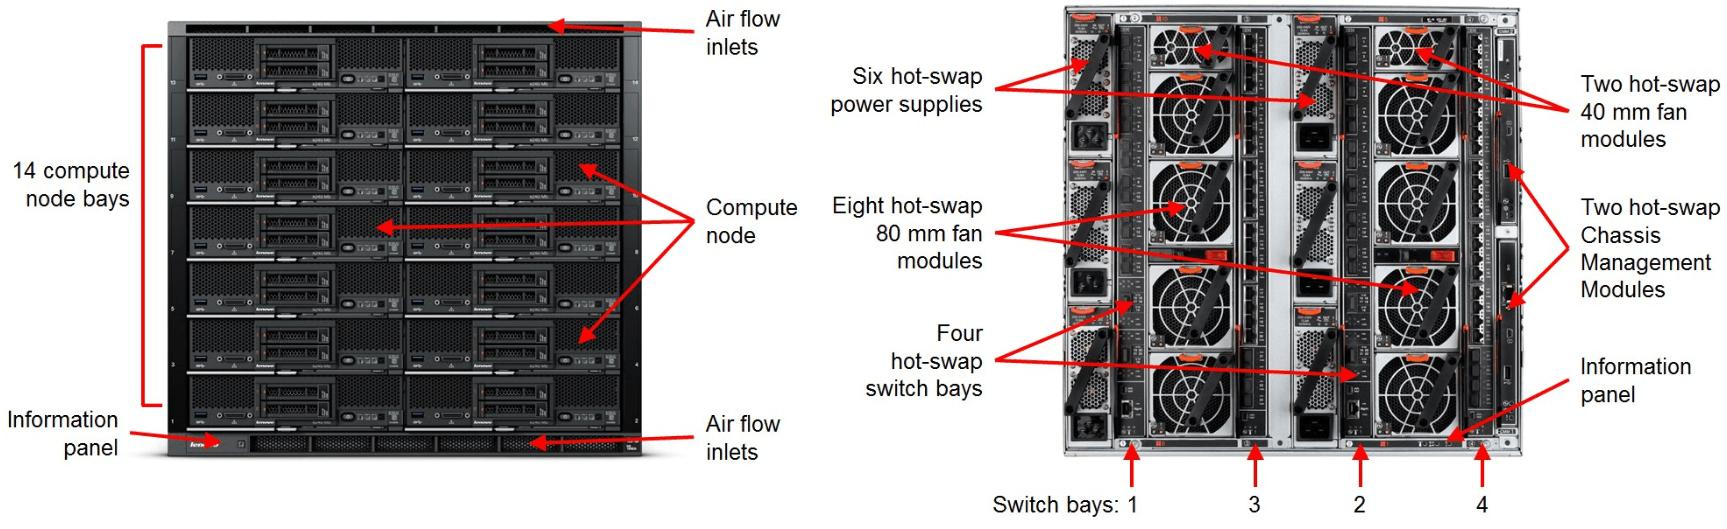 Lenovo Flex System Enterprise Chassis View